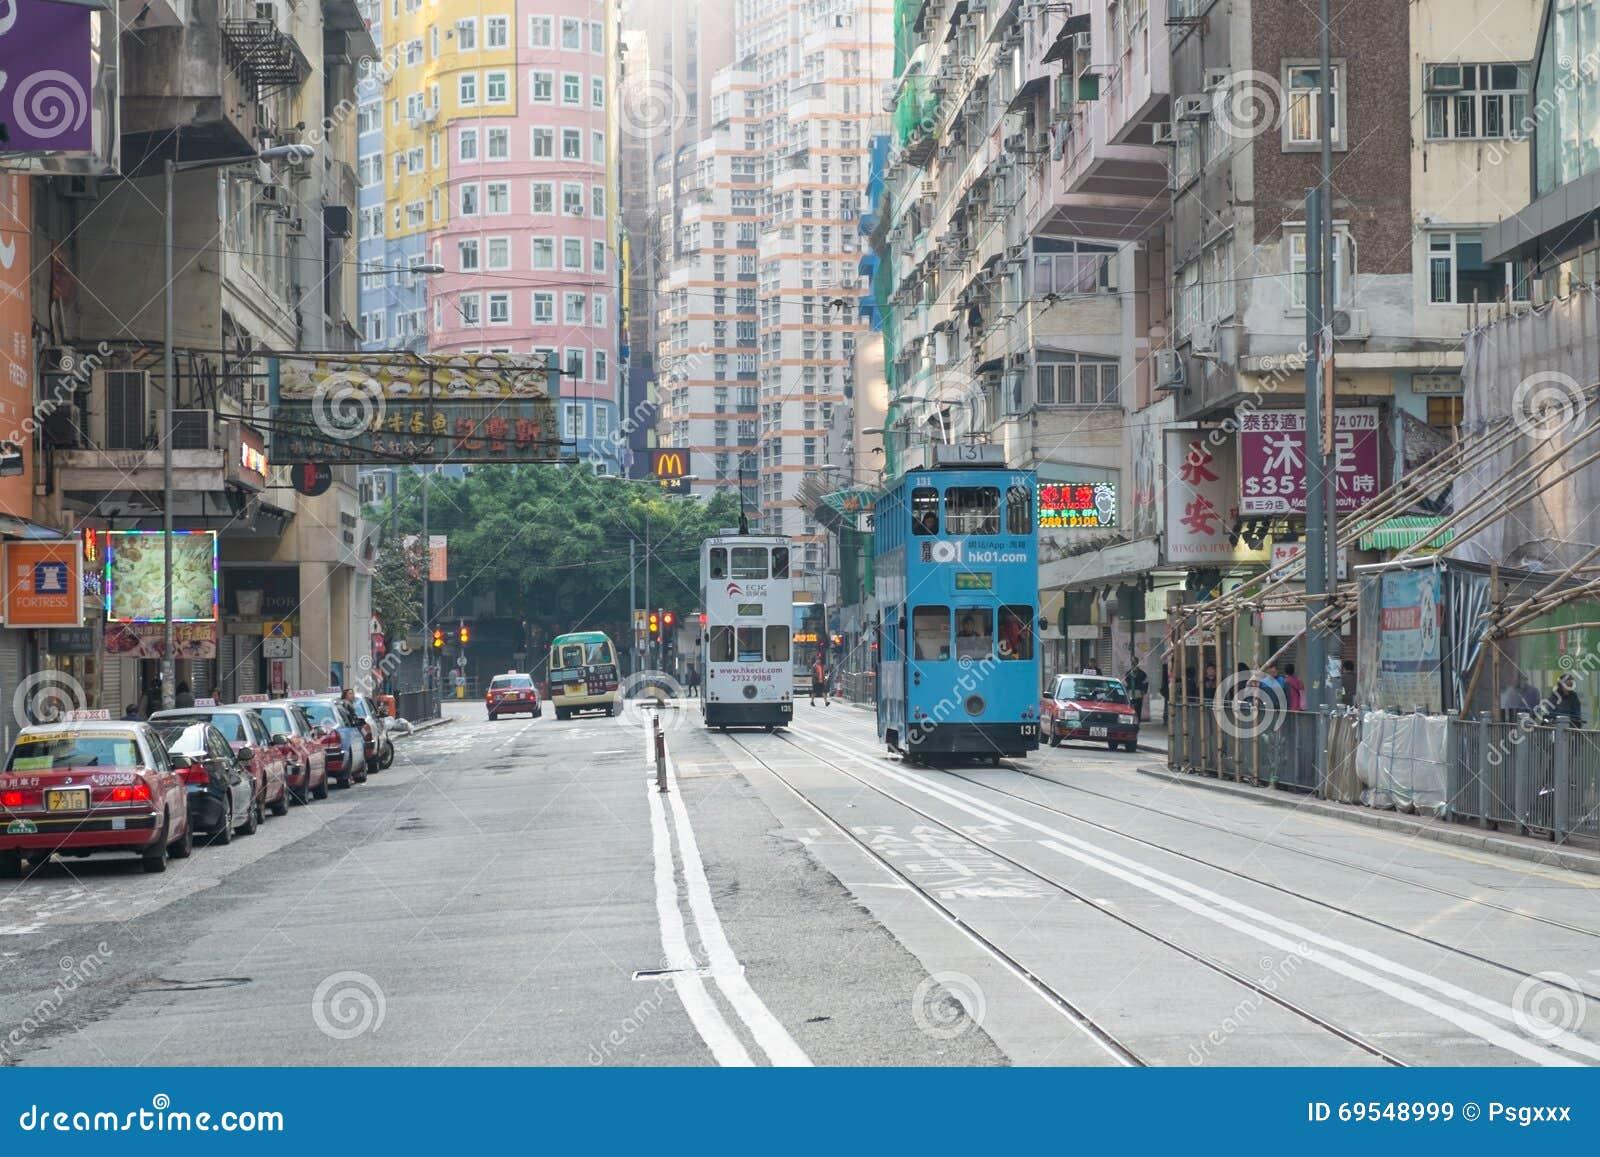 wan chai district hong kong on march 27 2016 the hong kong light